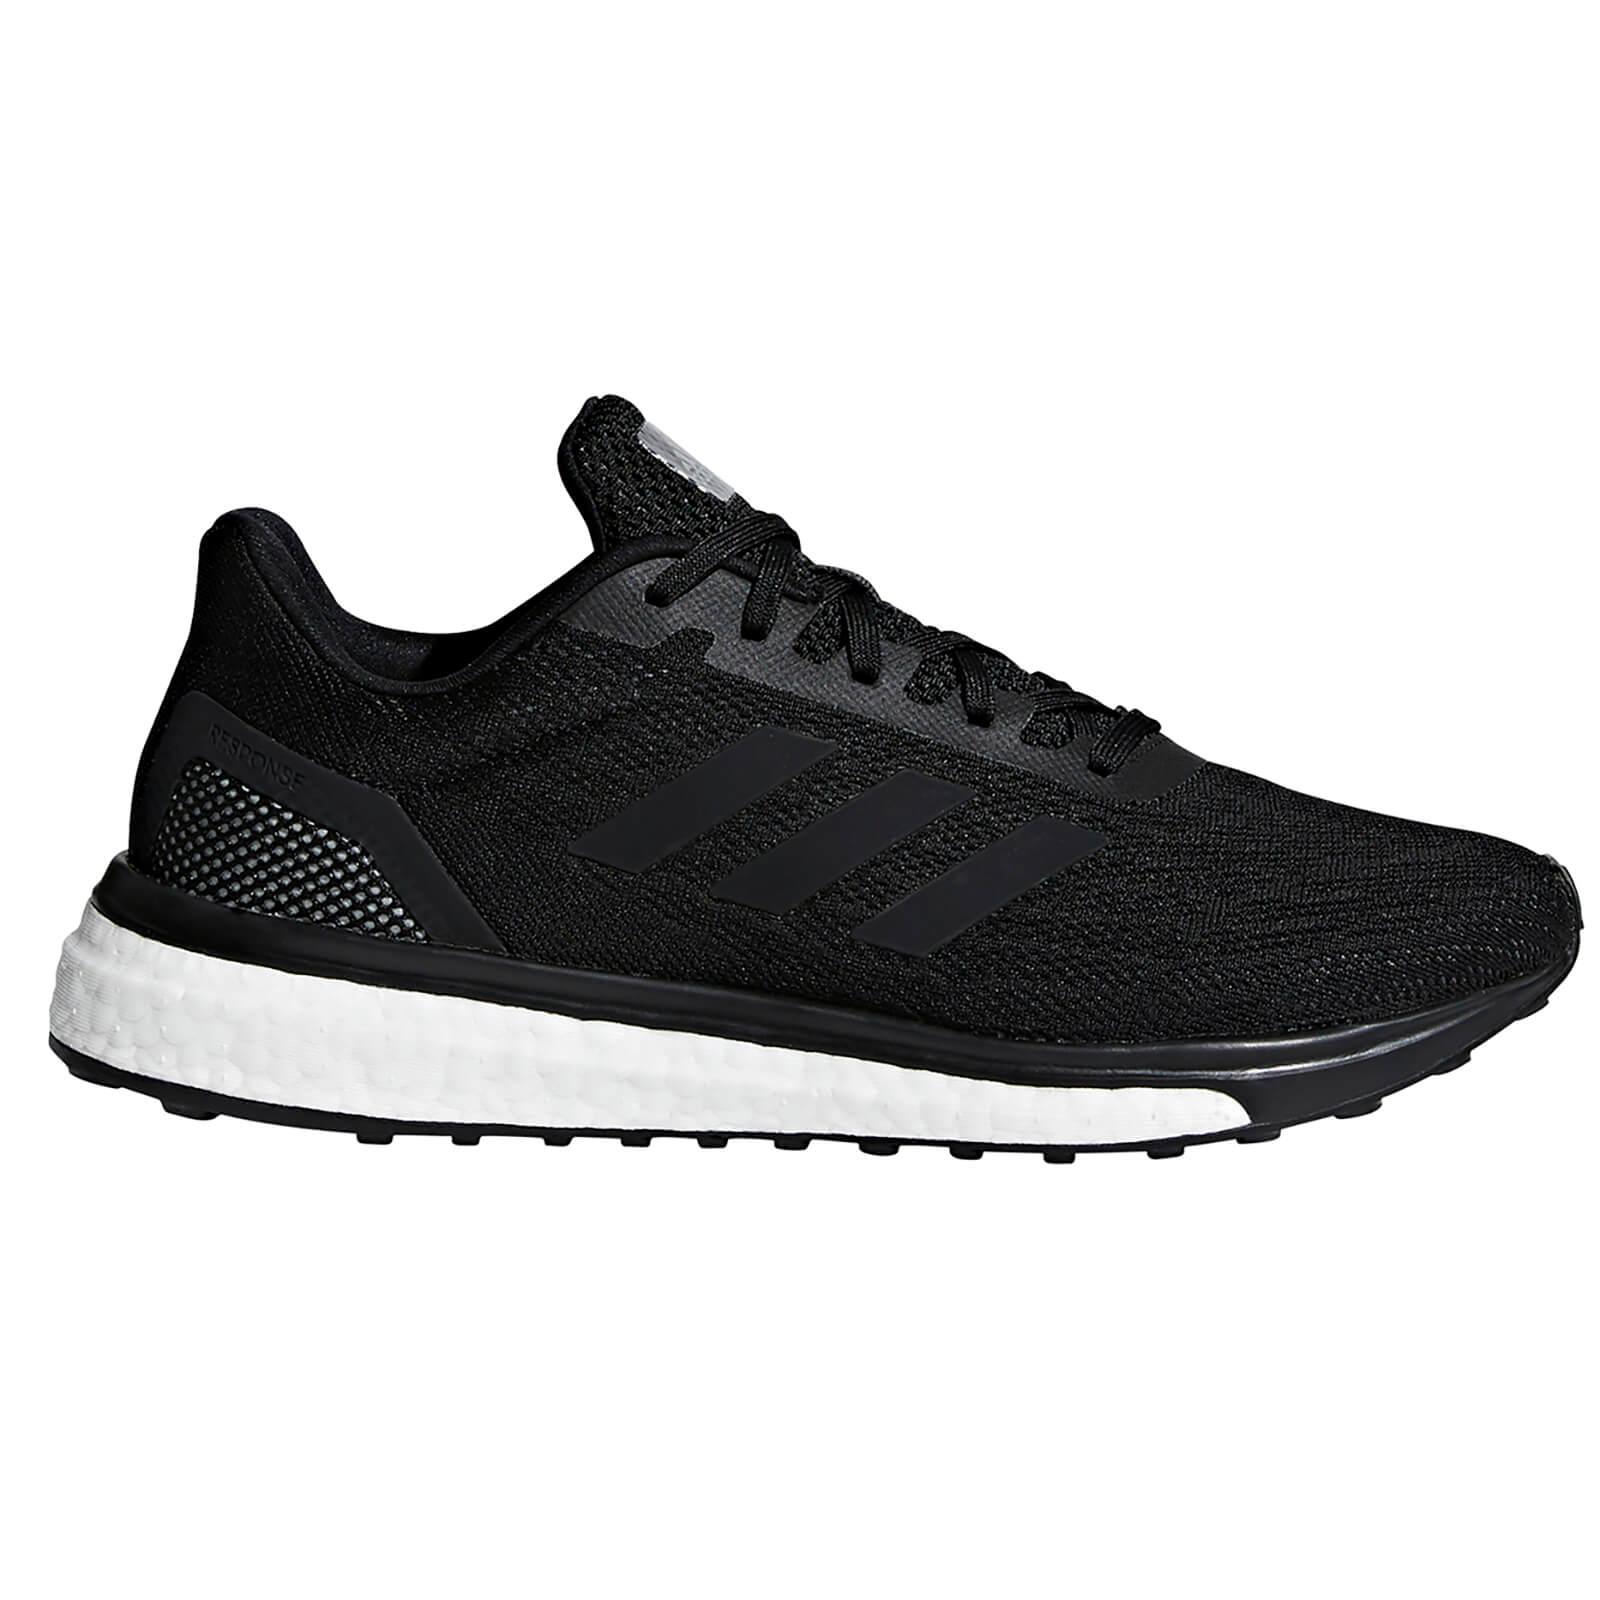 adidas Women's Response Running Shoes - White/Black - US 6.5/UK 5 - White/Black